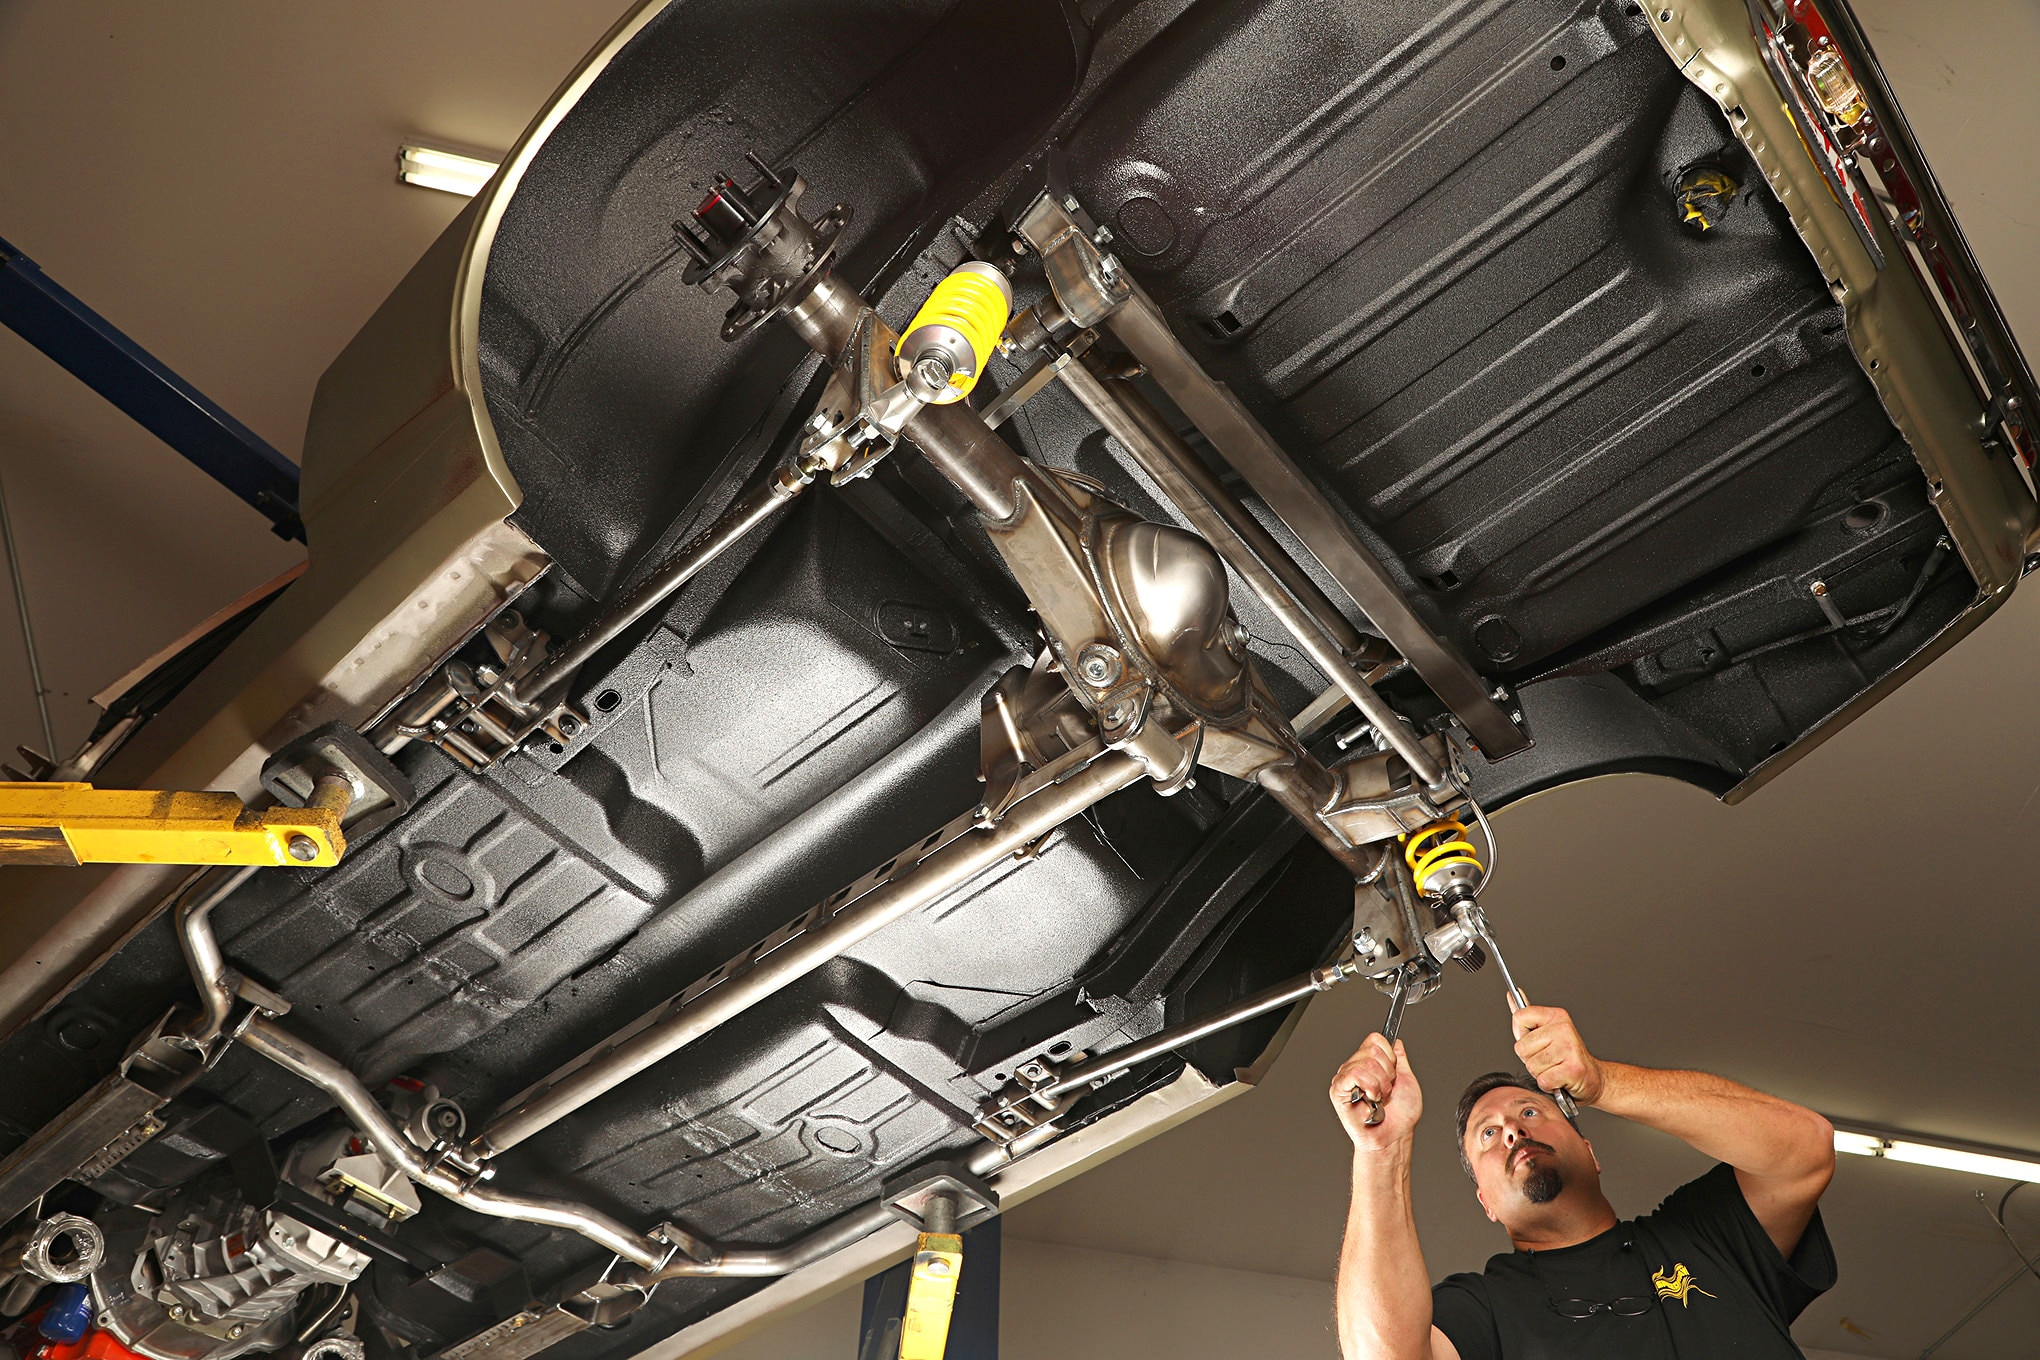 speedway motors weld on exhaust hanger bracket 10 inch long car truck exhaust hangers clamps flanges auto parts and vehicles